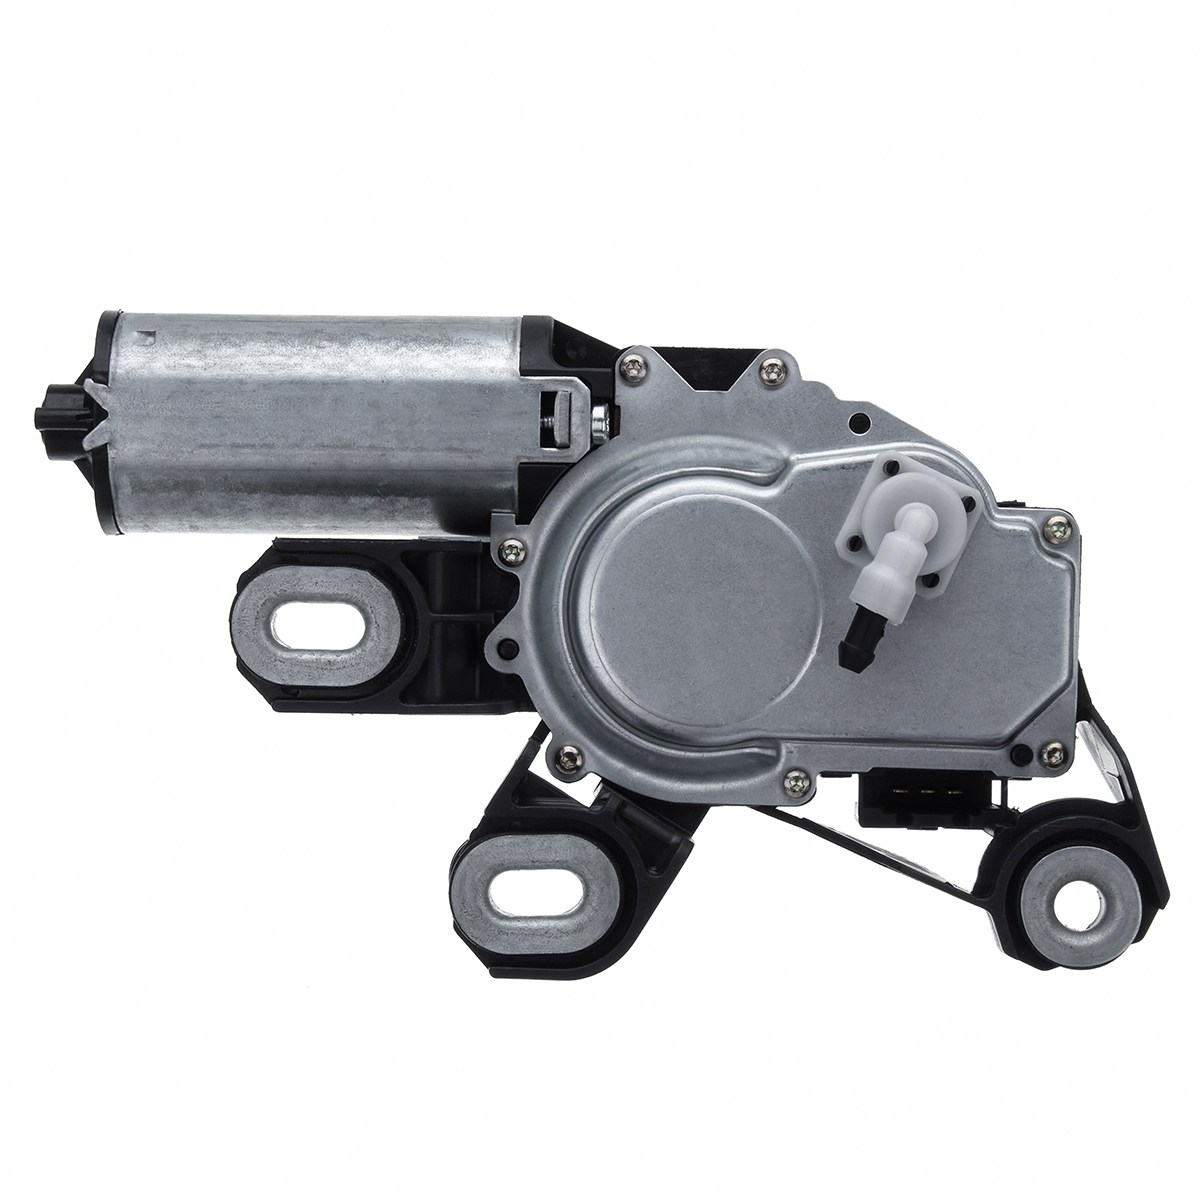 Rear Wiper Motor 6398200408 A6398200408 For Mercedes Viano Vito Mixto W639 2003-2016 new free shipping mercedes vito viano w639 rear air suspension air spring airbag repair kit 6393280101 6393280201